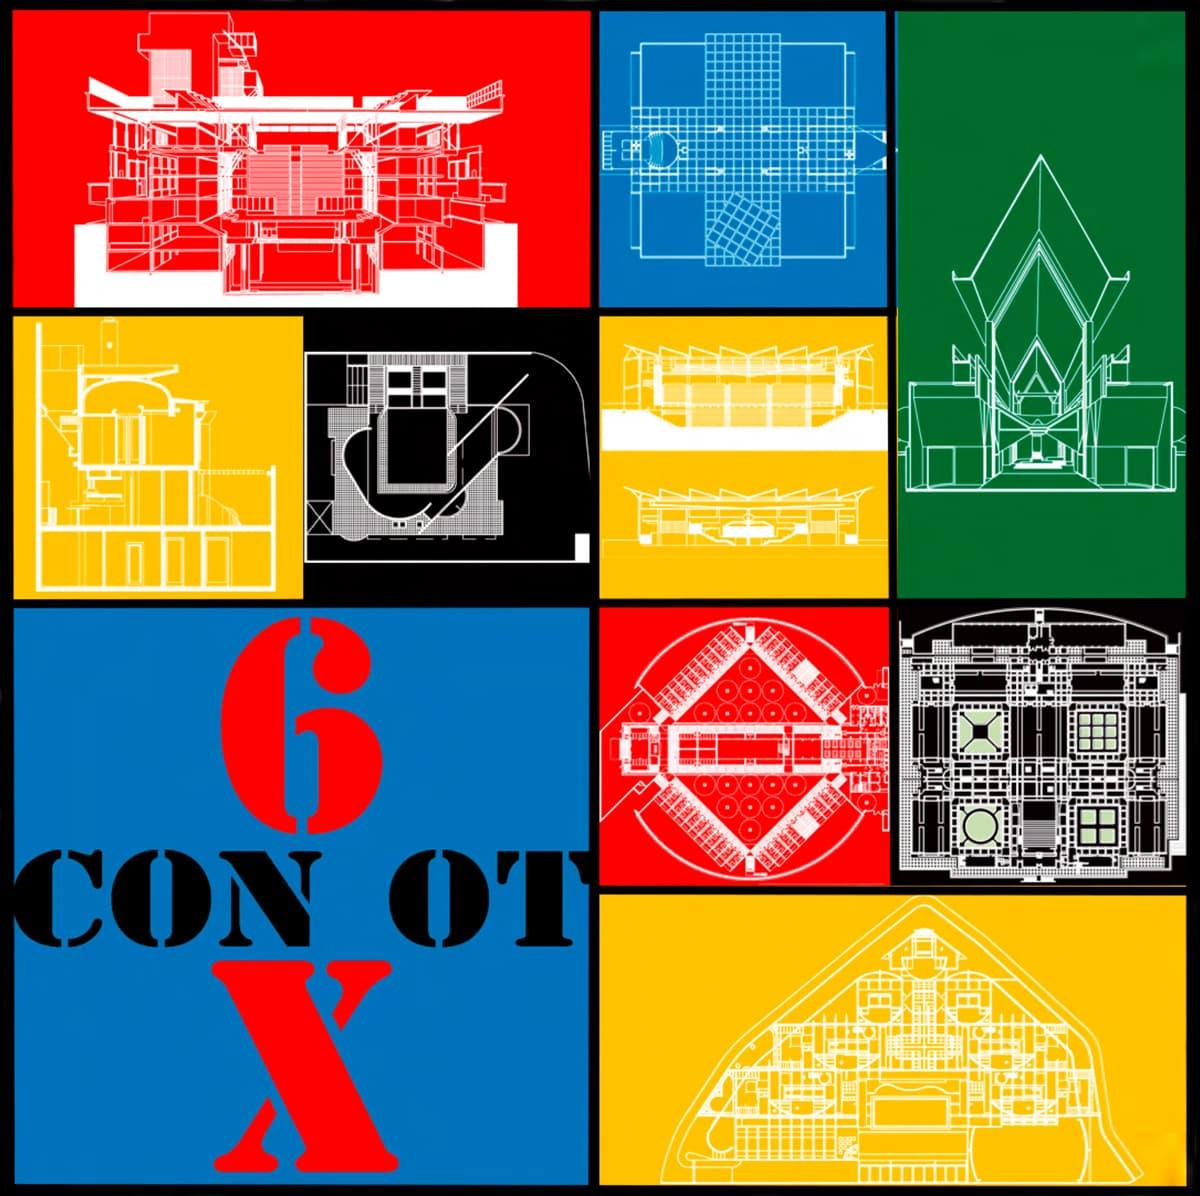 REFLEXIÓN-COMPARTIDA-SOBRE-EL-TRABAJO-DE-OSCAR-TENREIRO